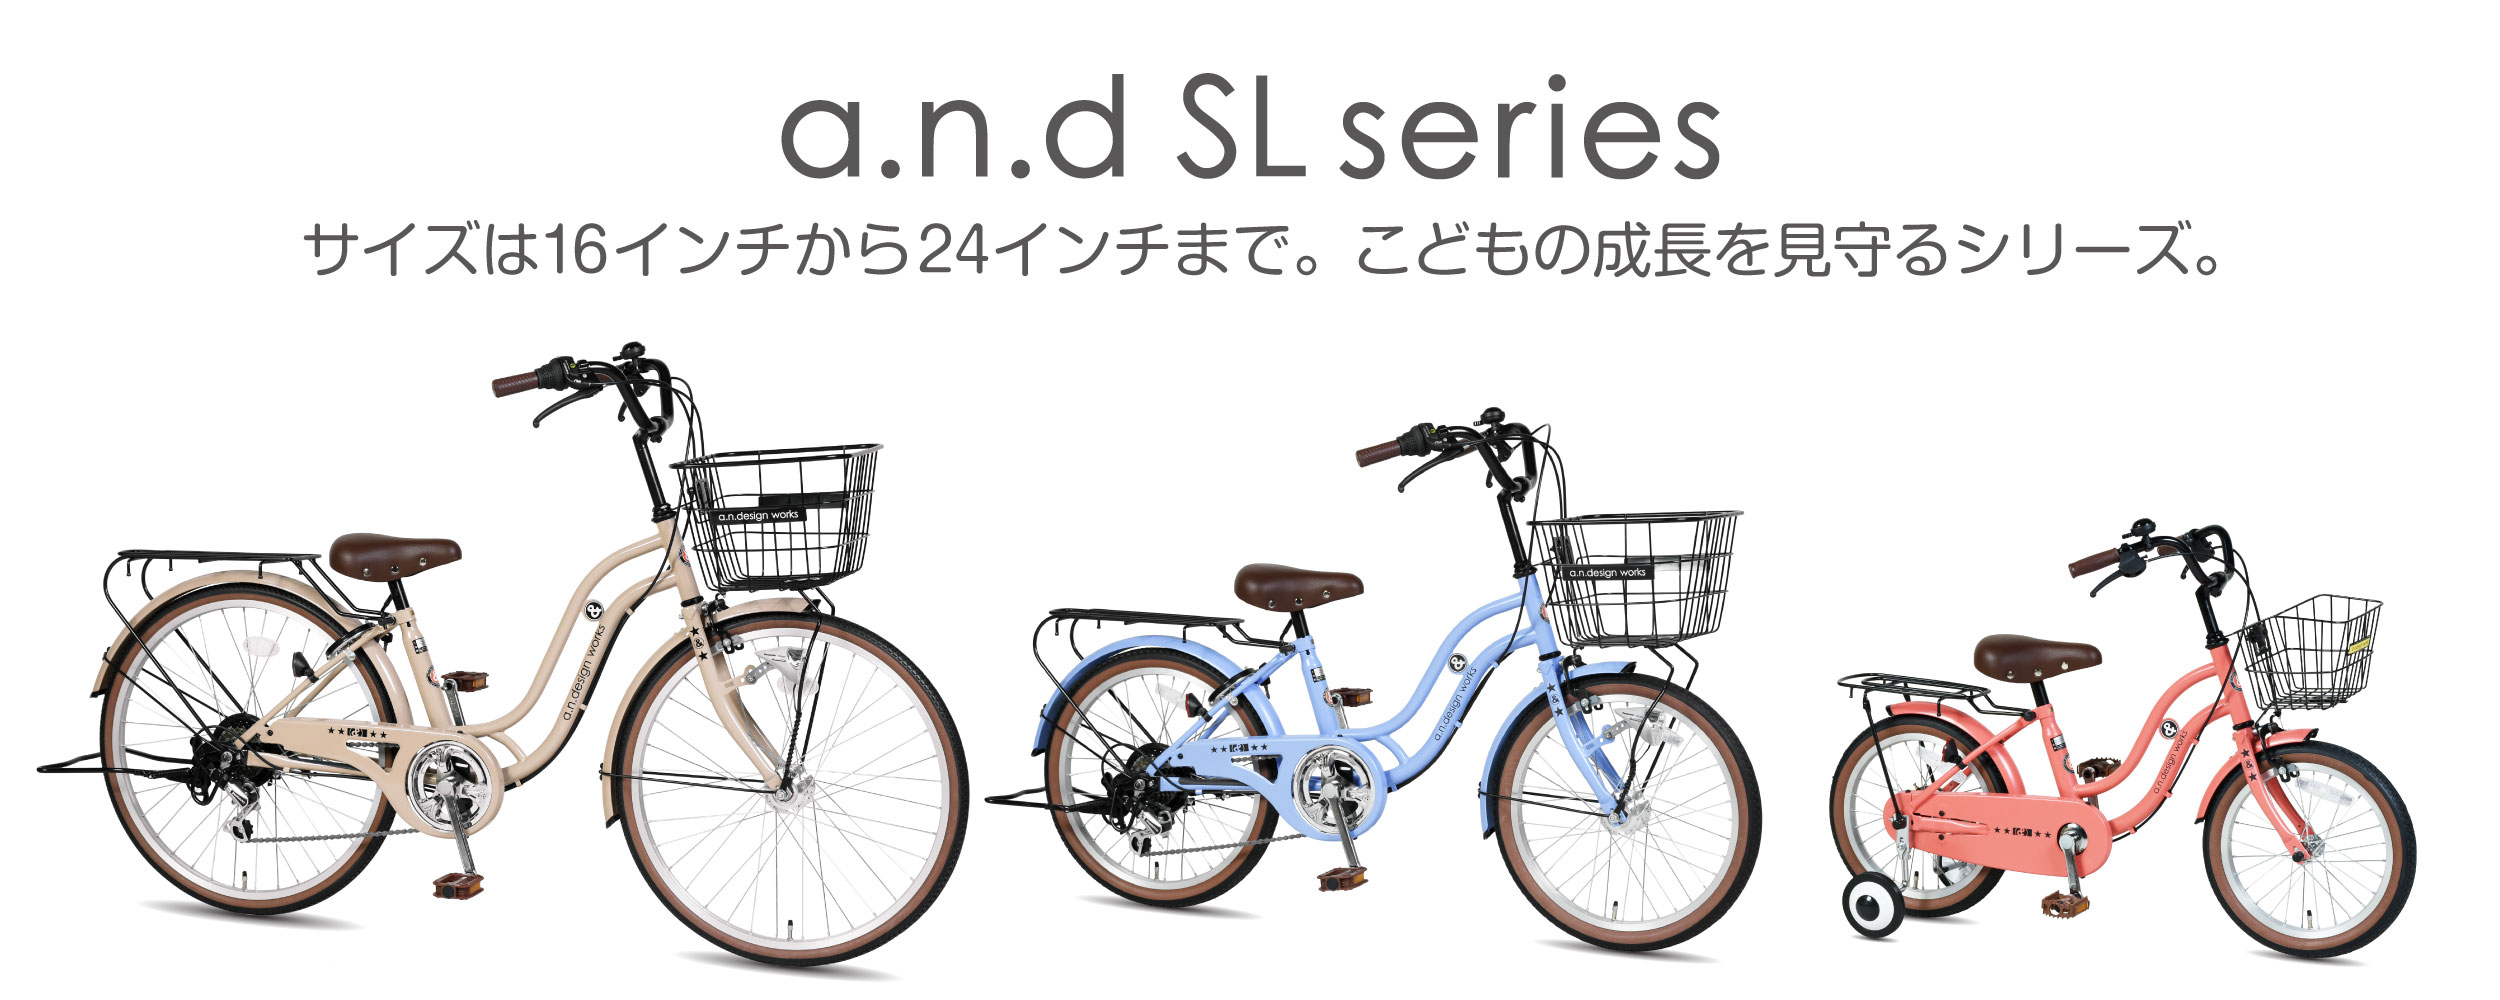 New Model : SLシリーズ誕生。幼児から大人まで